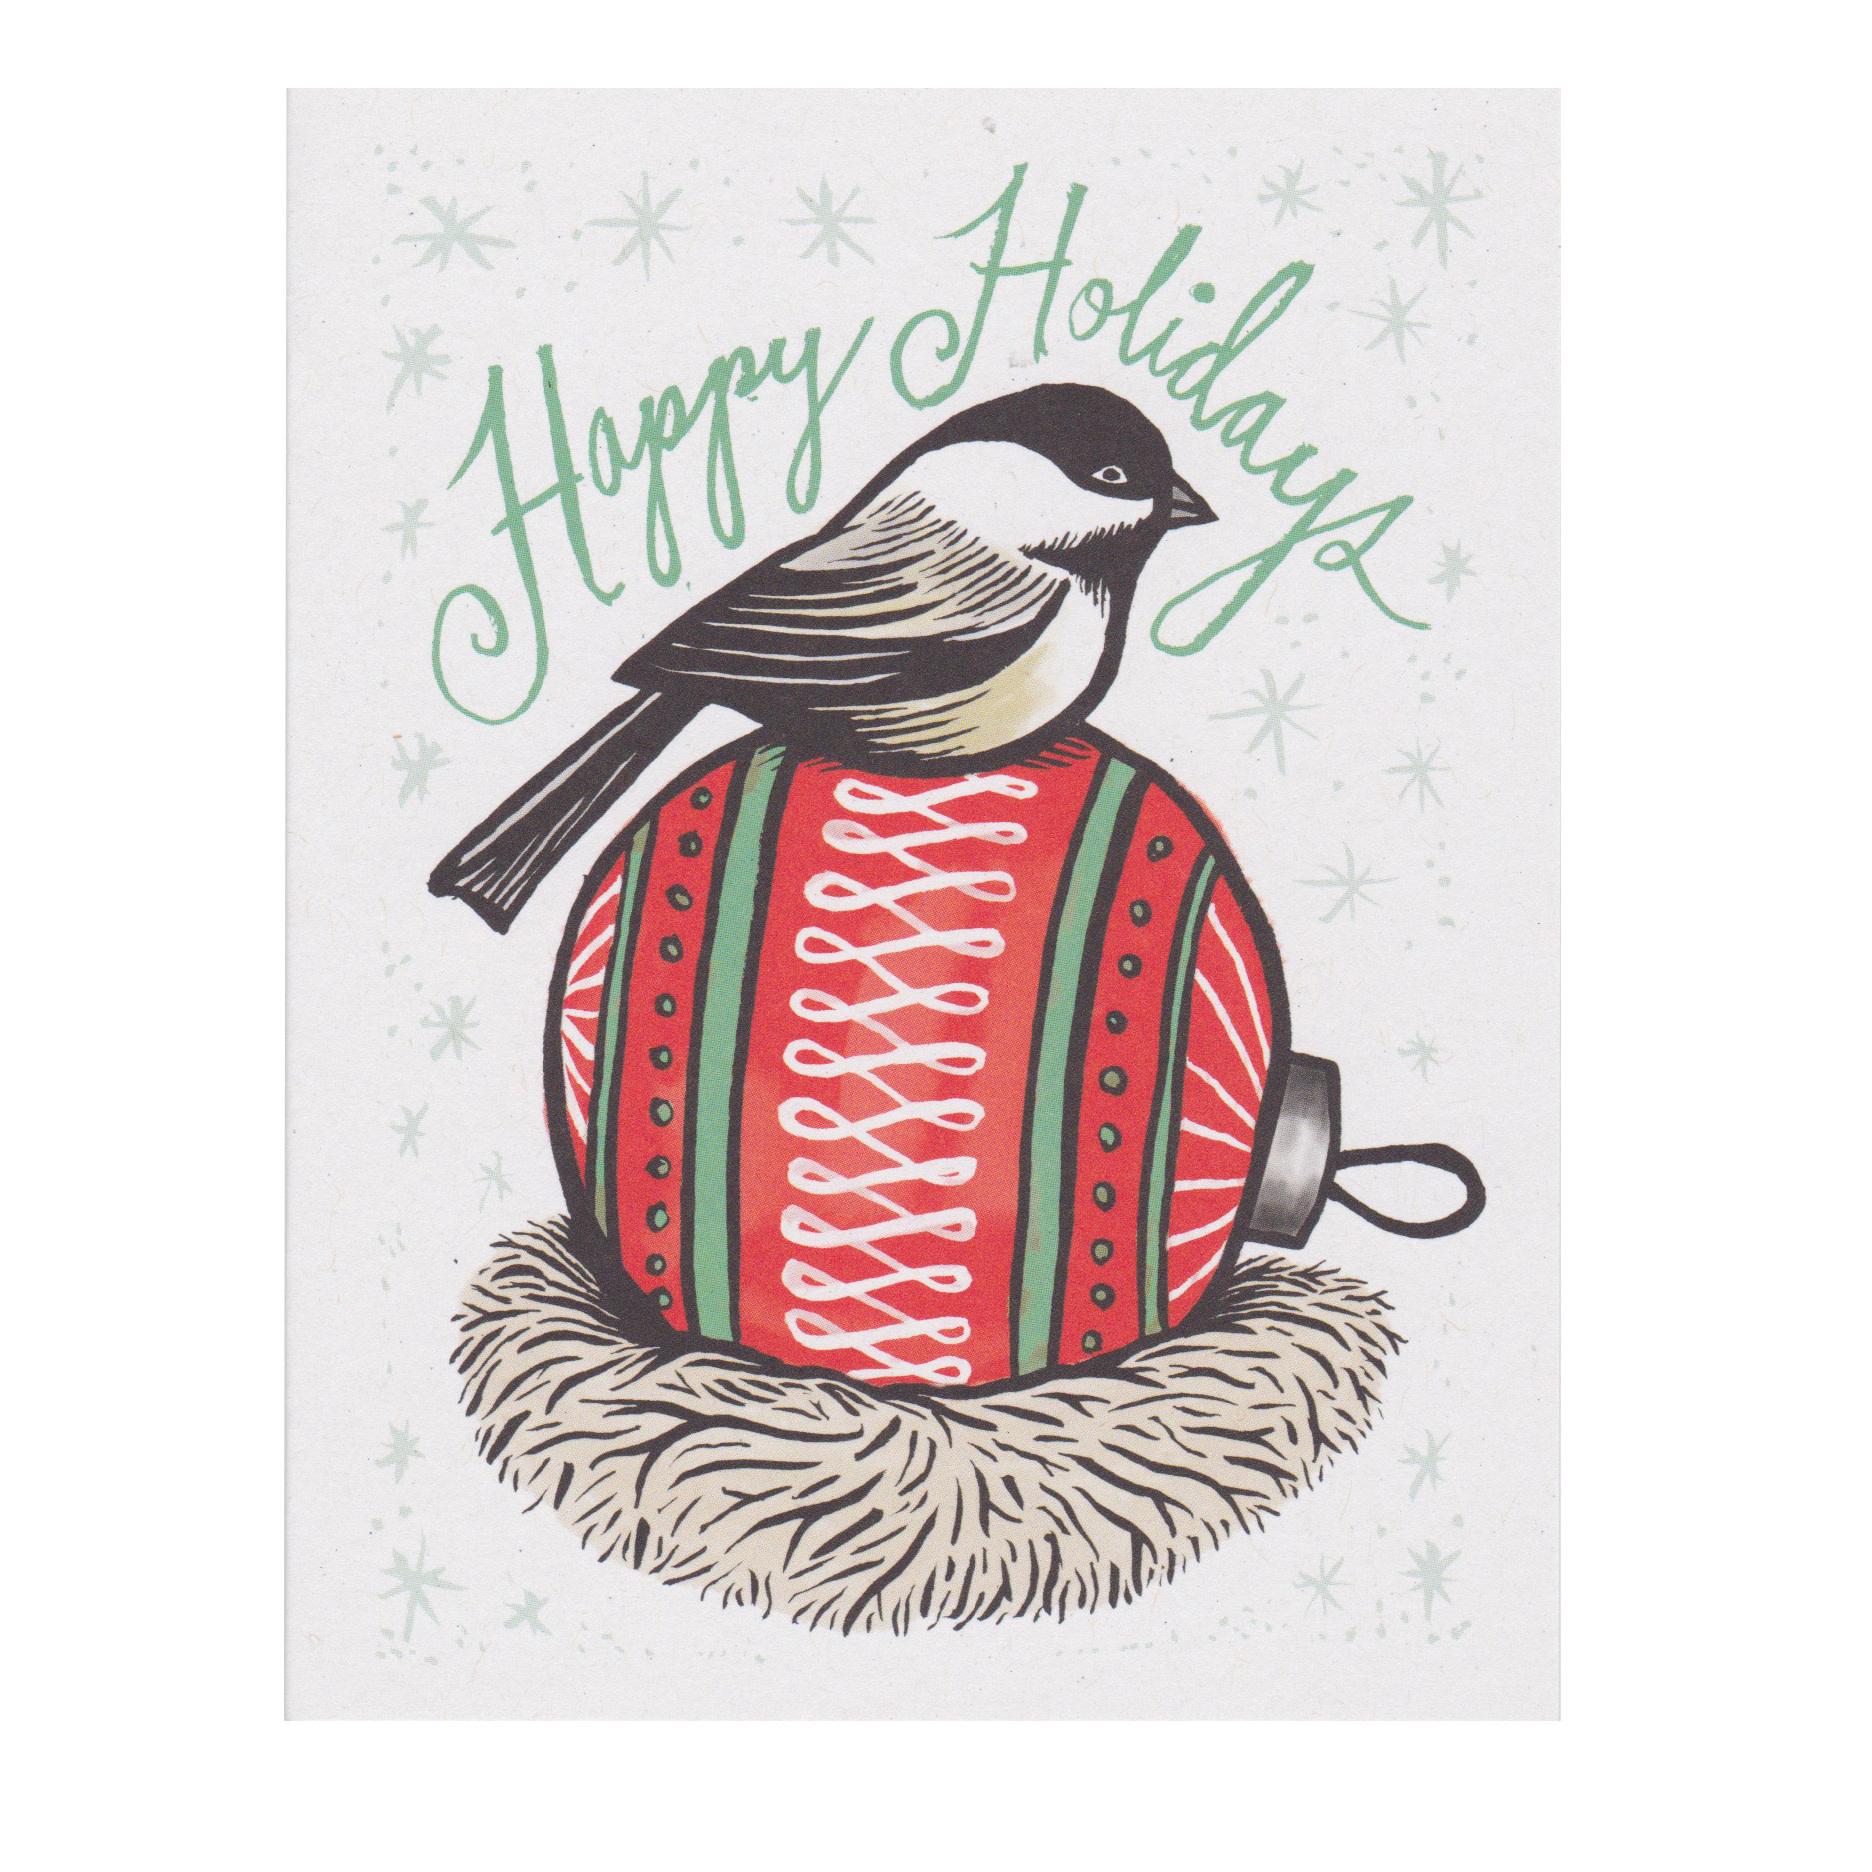 Daytrip Society Happy Holidays Chickadee Ball Card - Set of 10